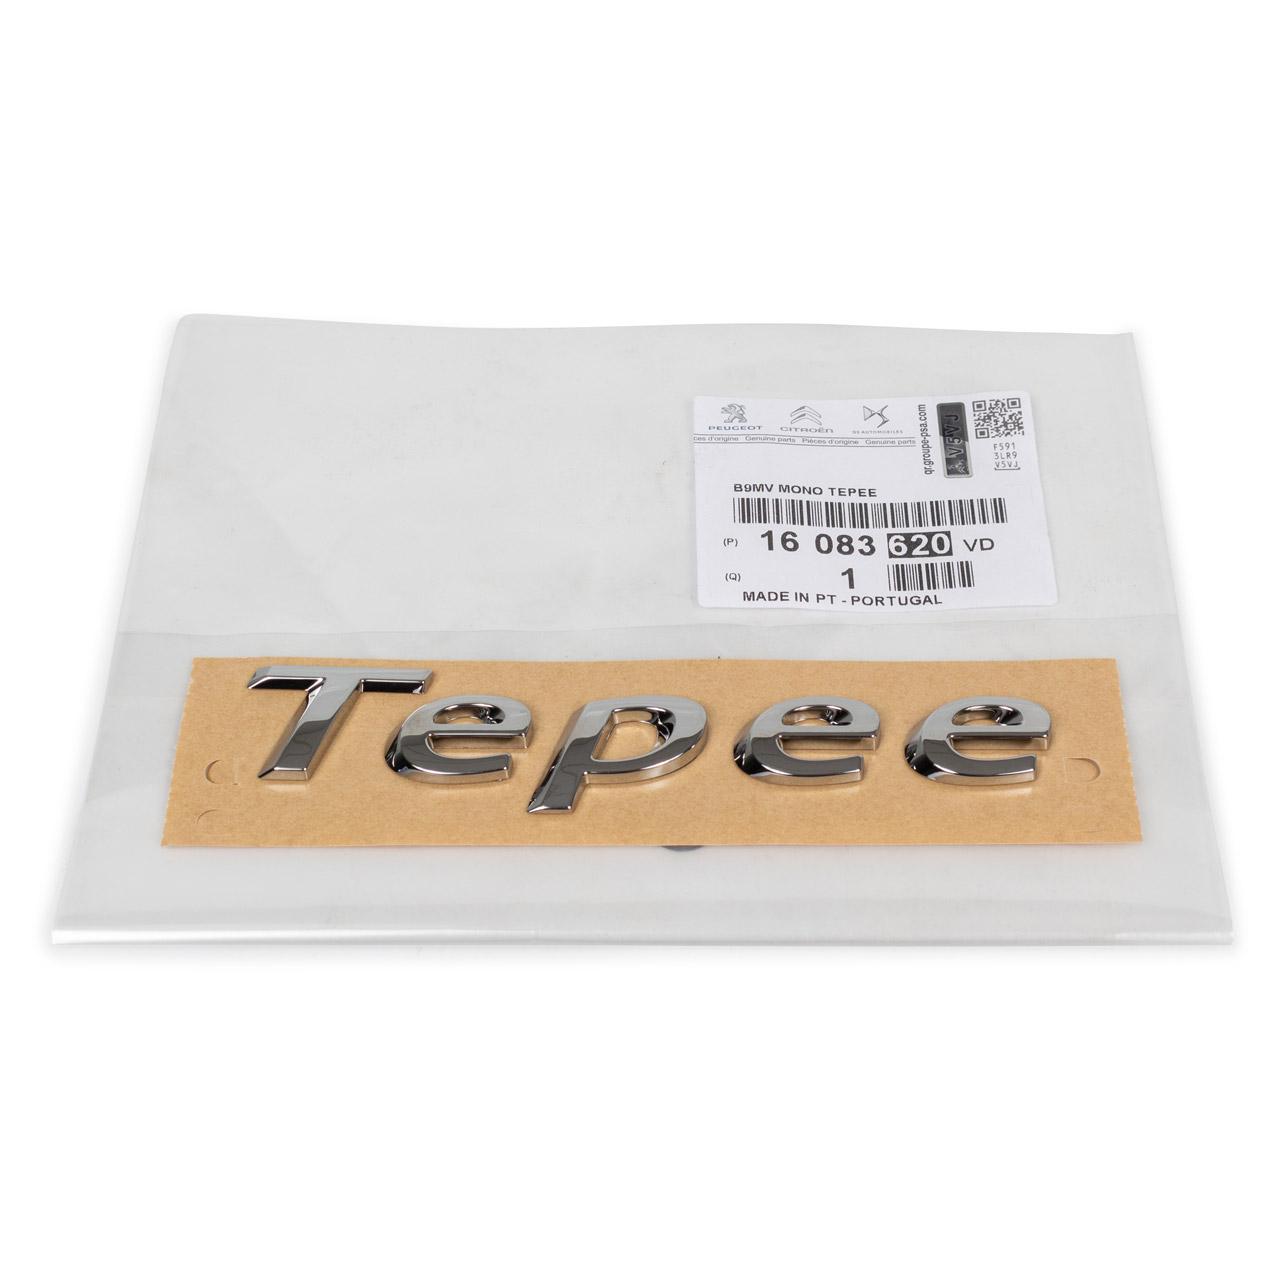 ORIGINAL Peugeot Emblem Schriftzug Fahrzeugheckklappe Partner Tepee 16083620VD